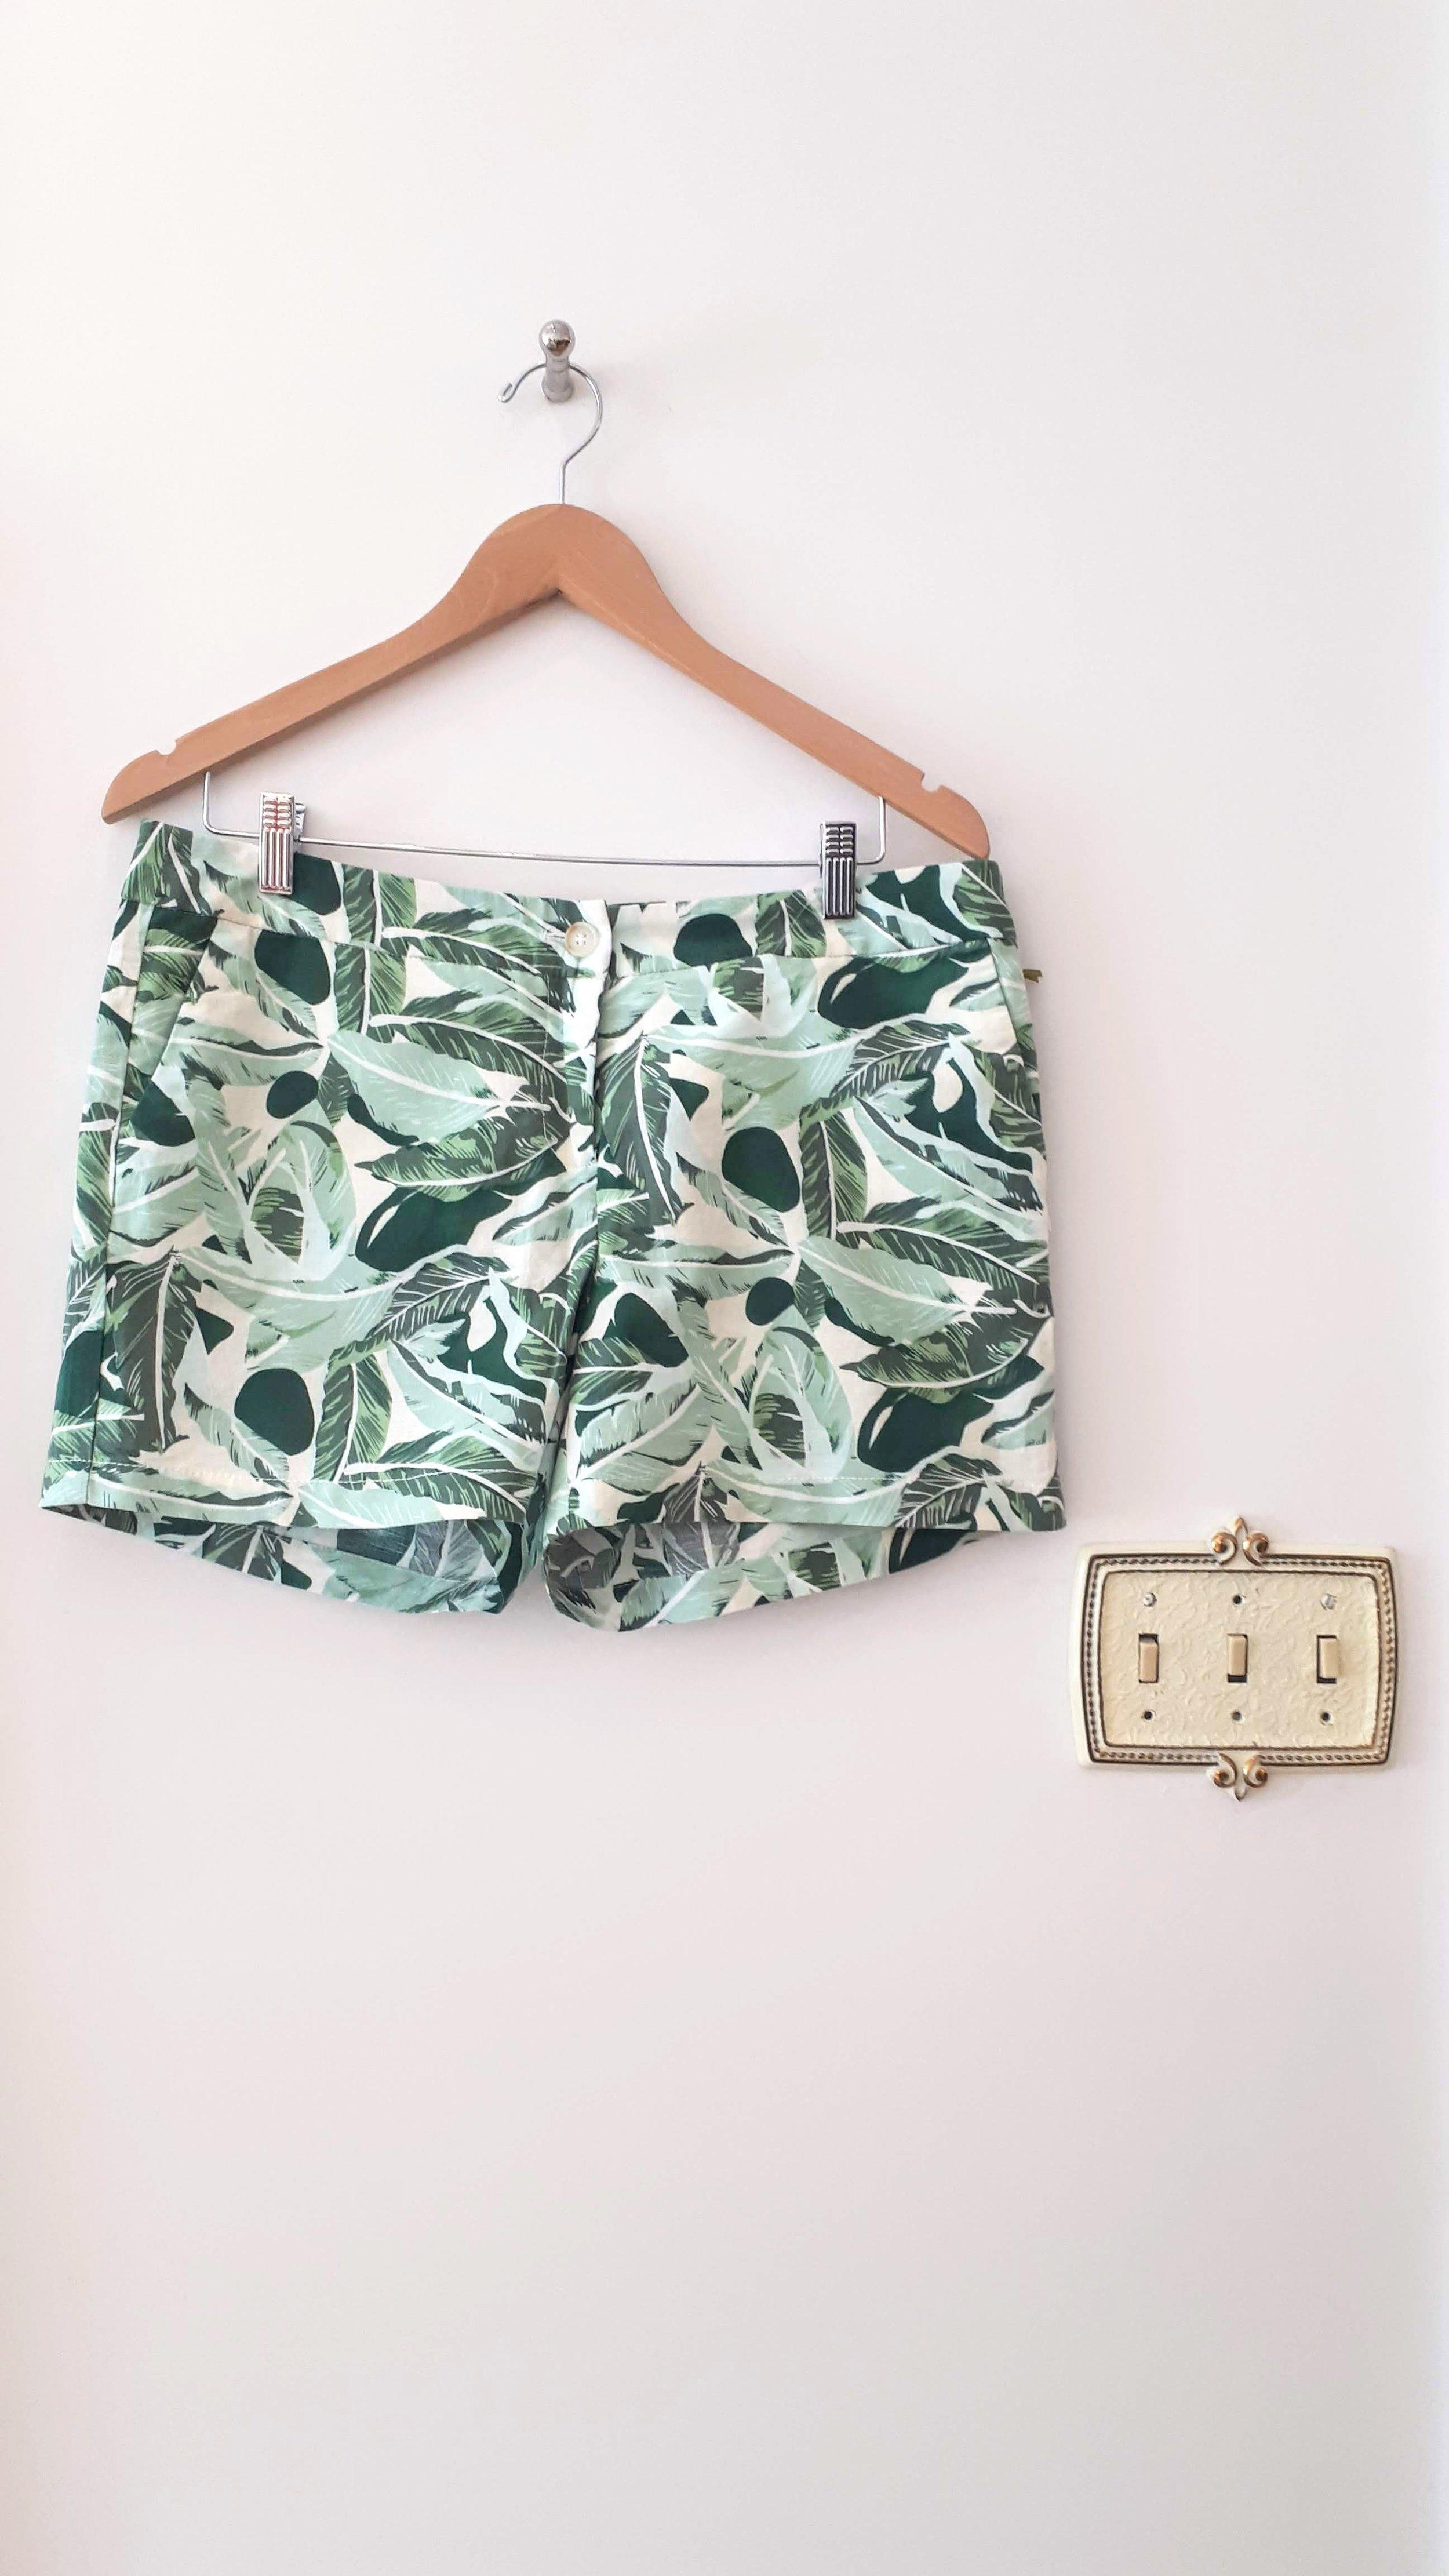 Saint-Tropez shorts (NWT); Size 12, $20